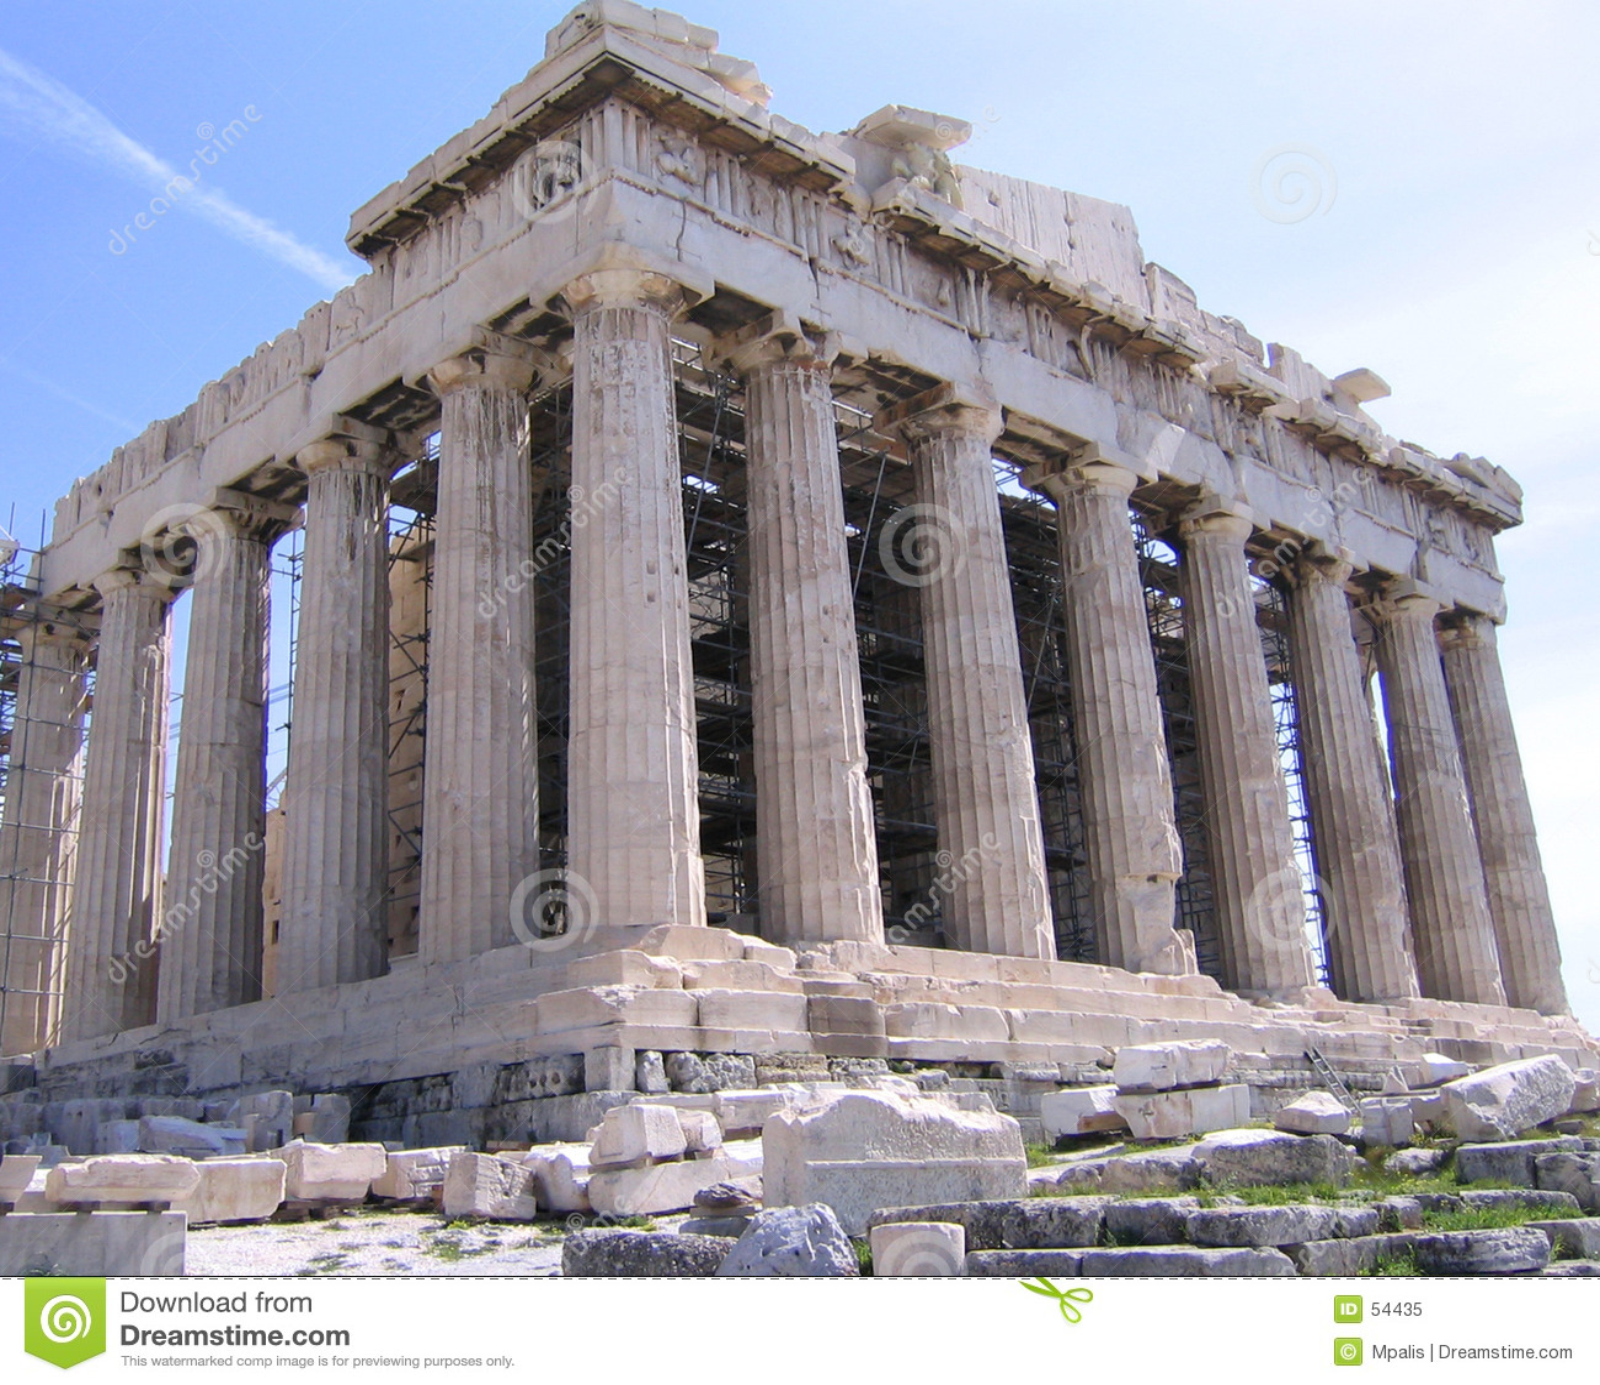 Parthenon at Acropolis hill in Athens Greece